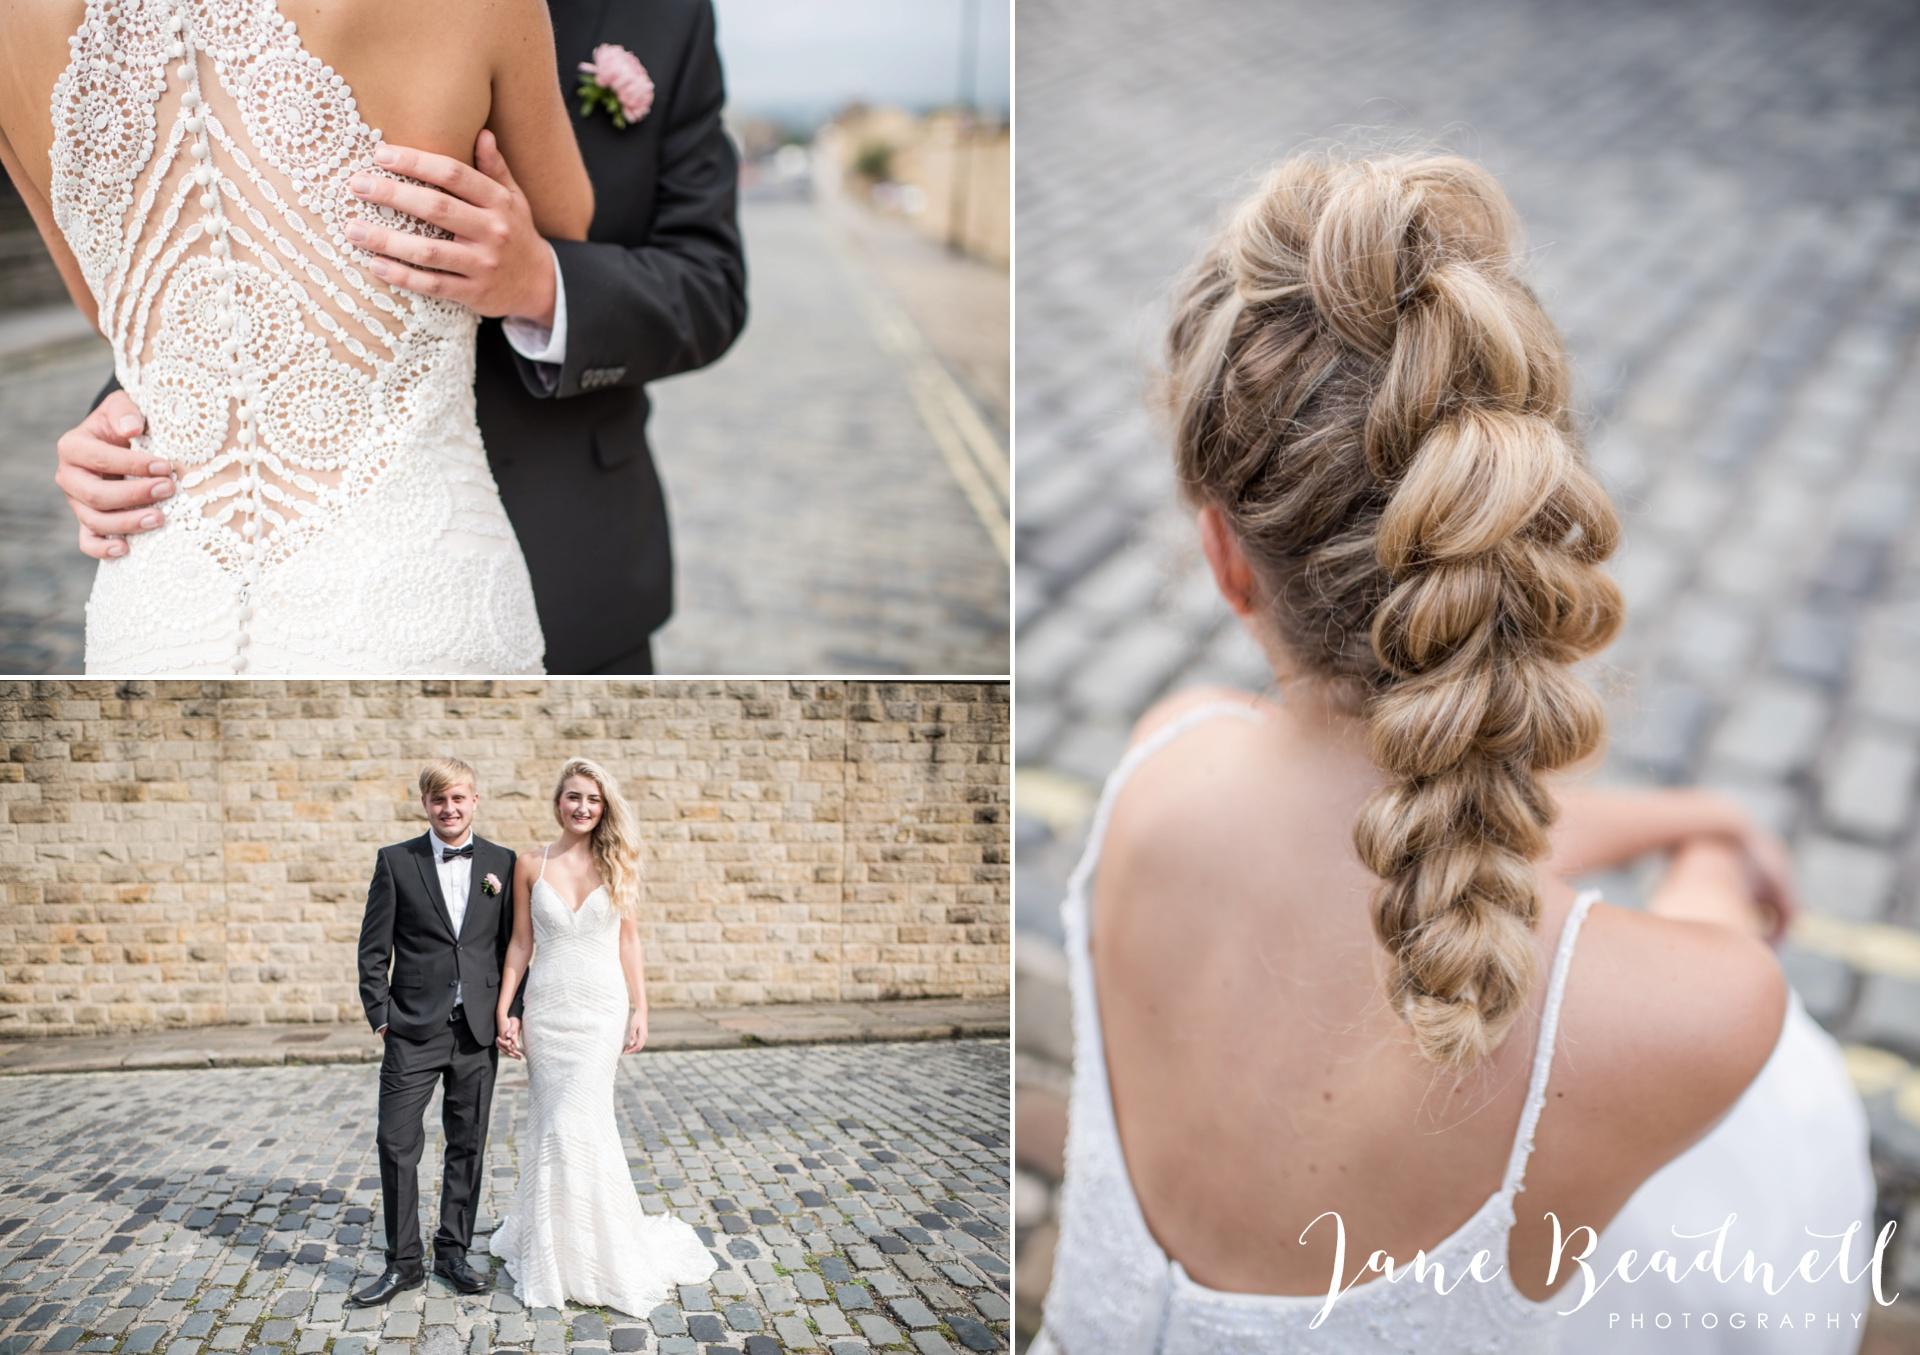 leafy-couture-wedding-flowers-otley-fine-art-wedding-photographer-jane-beadnell-photography_0020